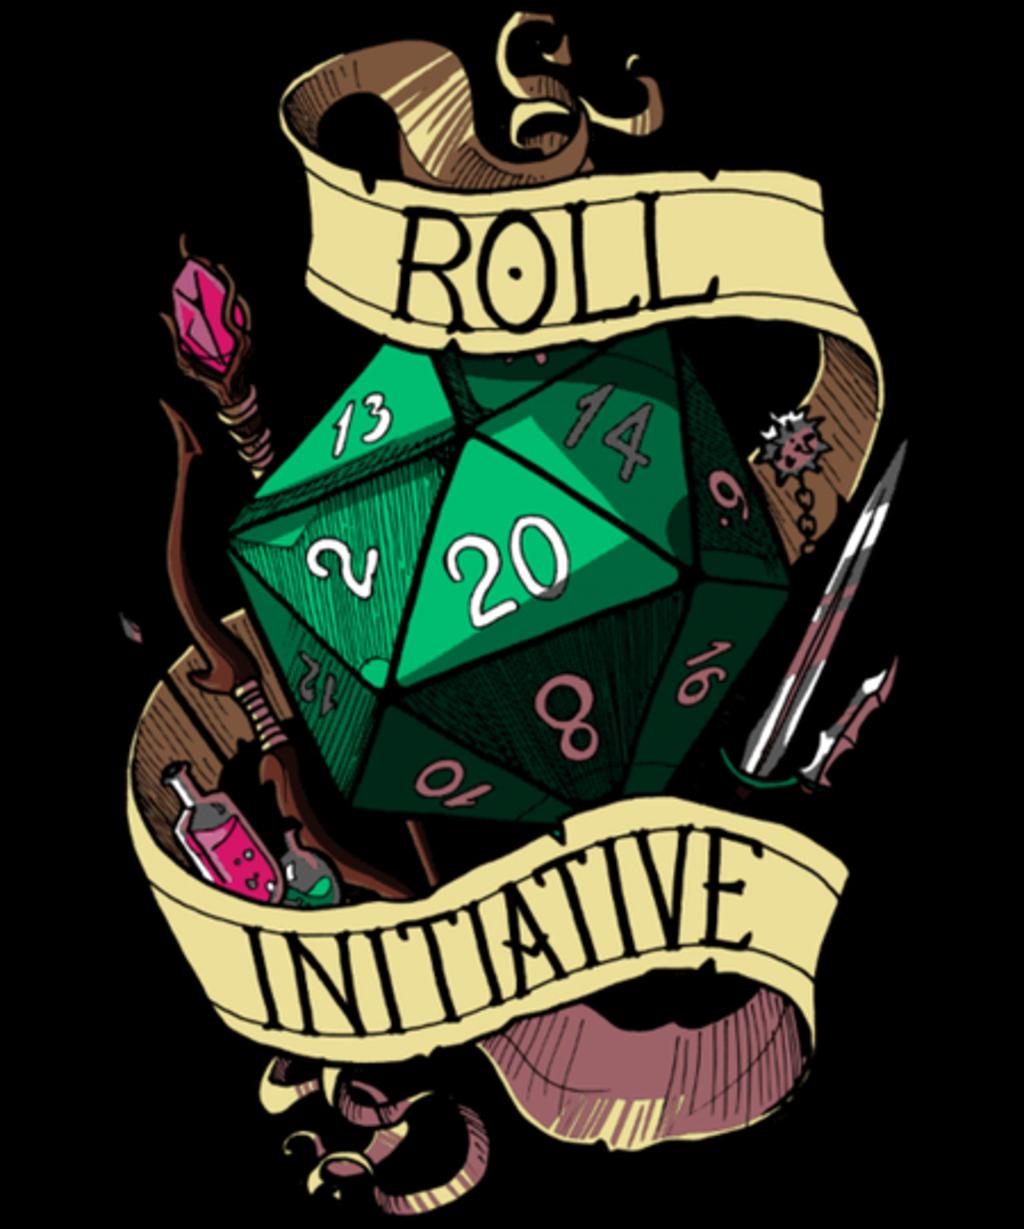 Qwertee: Roll Initiative